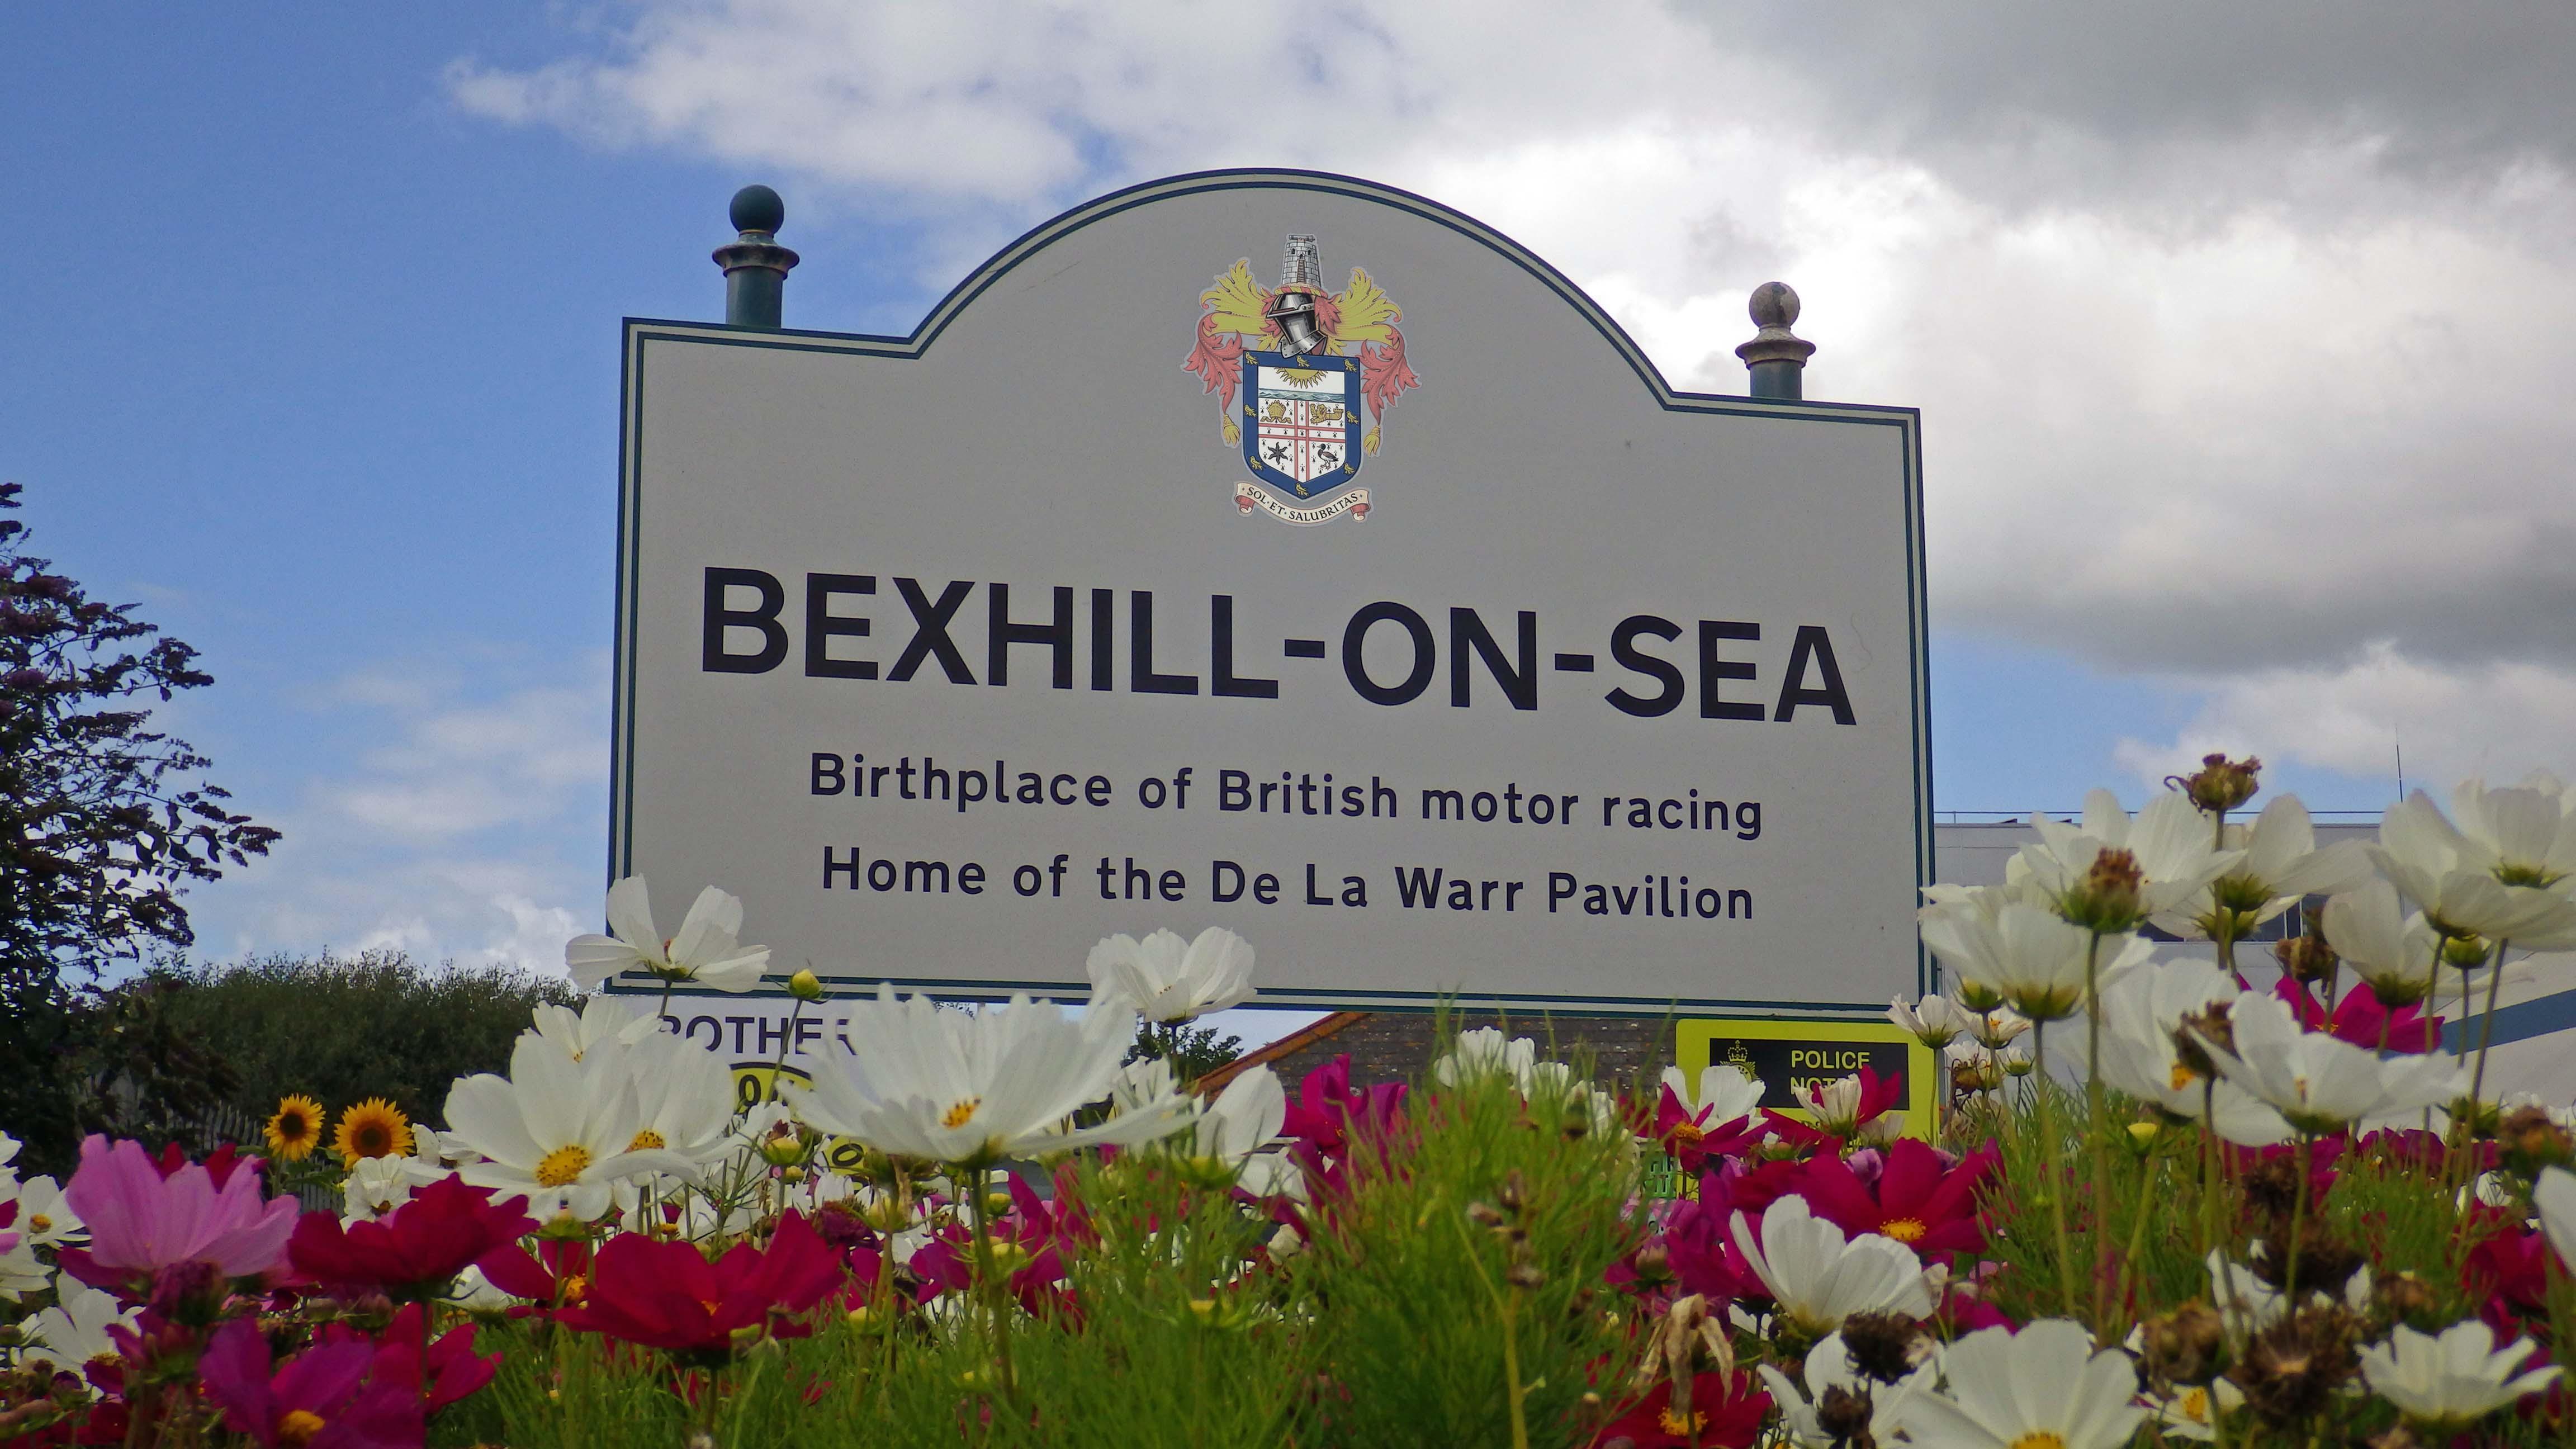 Bexhill-on-Sea - Wikipedia